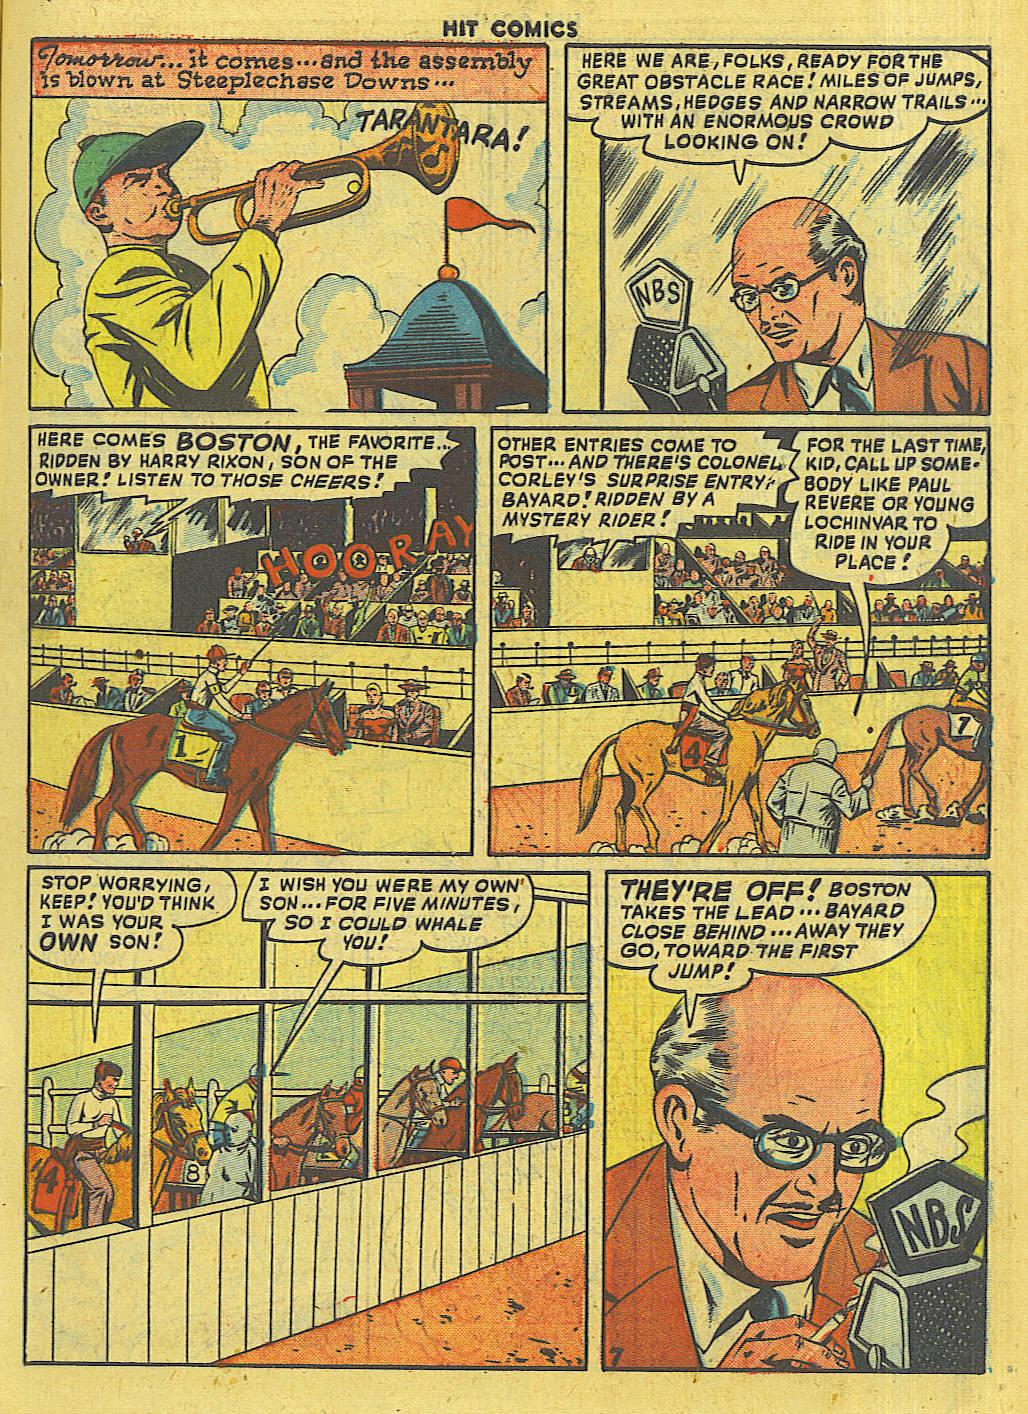 Read online Hit Comics comic -  Issue #56 - 9